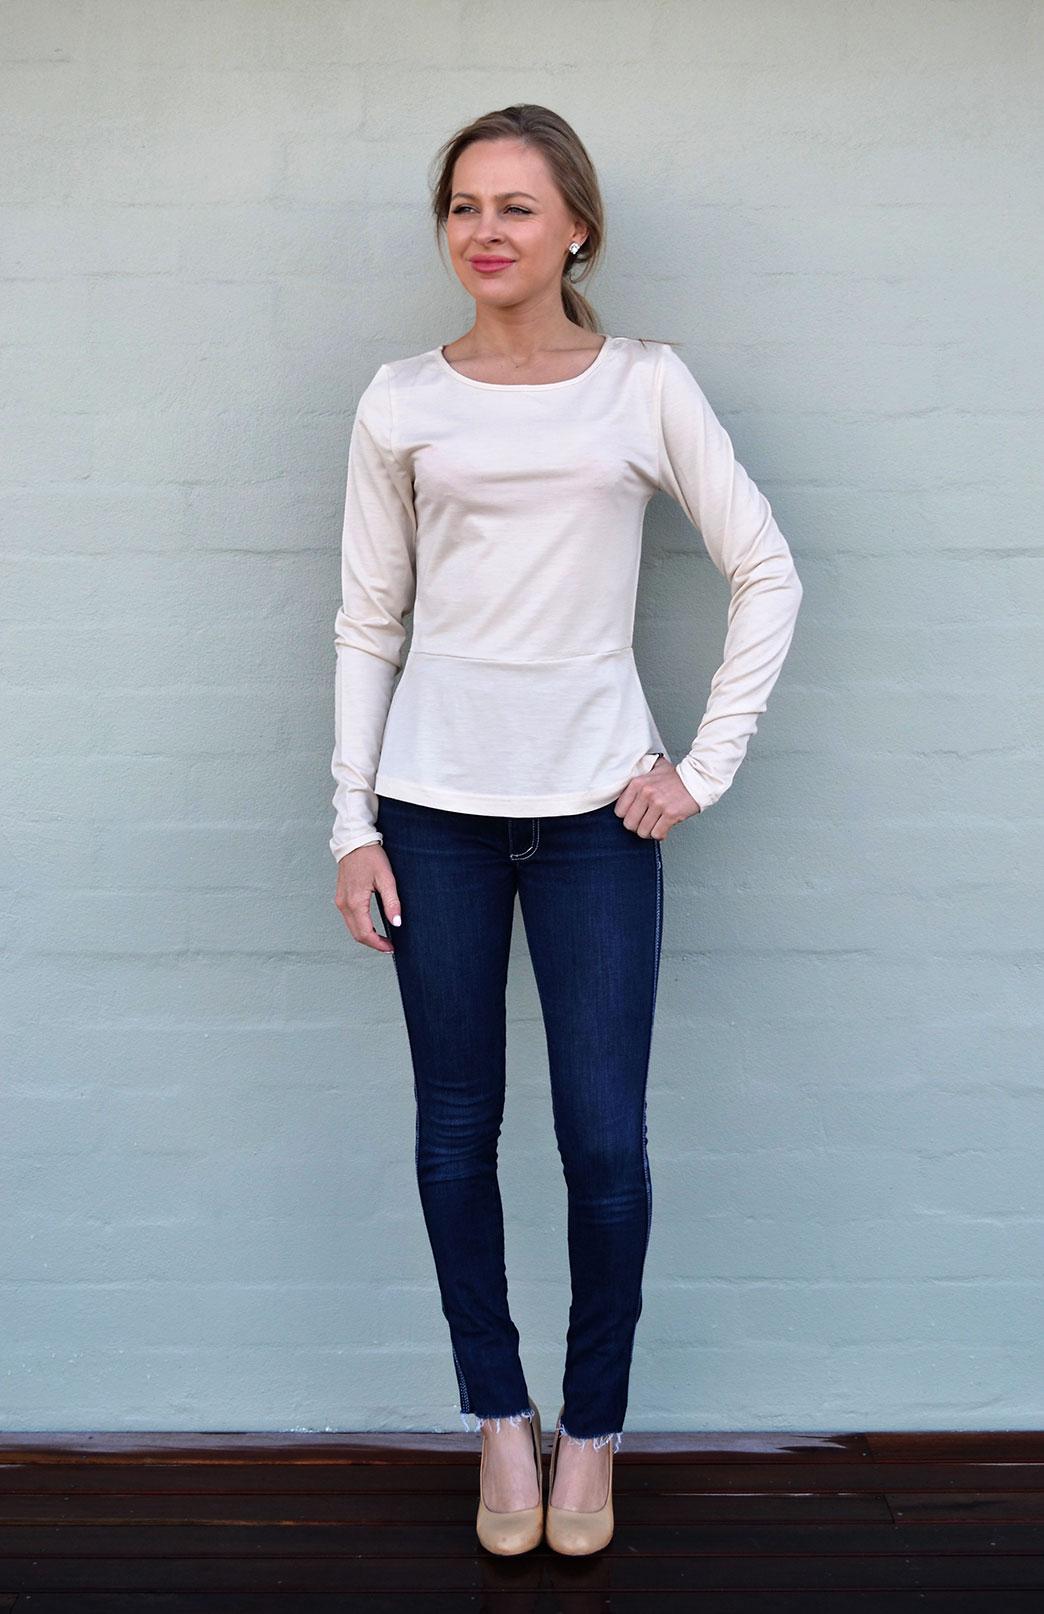 Peplum Top - Long Sleeved - Women's Cream Long Sleeve Wool Winter Top - Smitten Merino Tasmania Australia